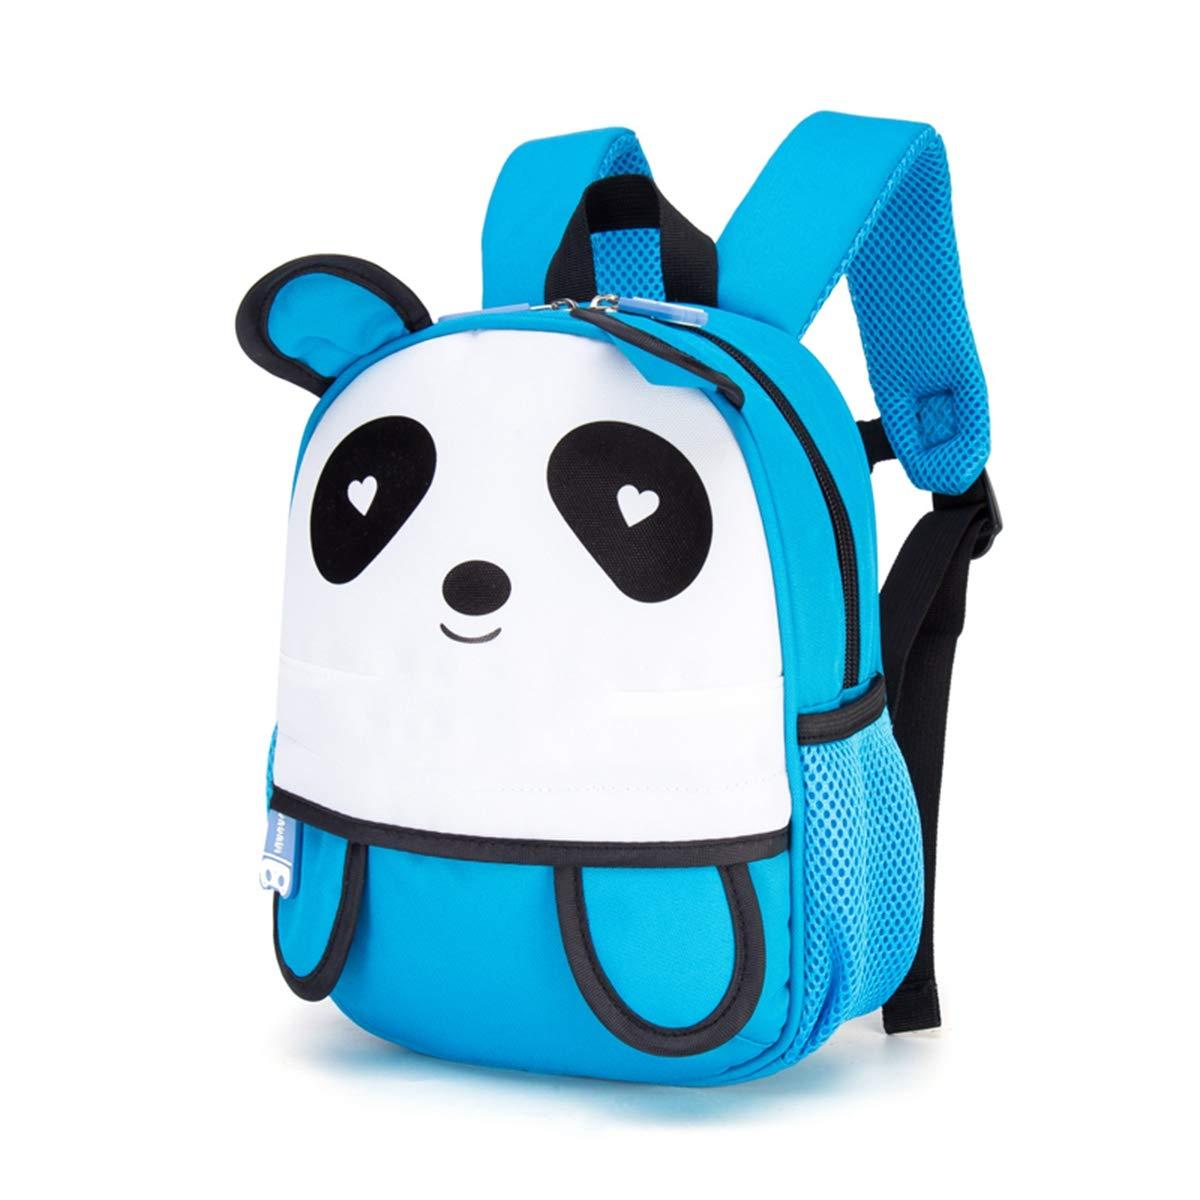 c35021b007 AHWZ 3D Bambini Bambini Bambini Zaino Carino Cartoon Bambino Panda Scuola  Borsa da Viaggio Zaino con Gancio perduto,blu 574514